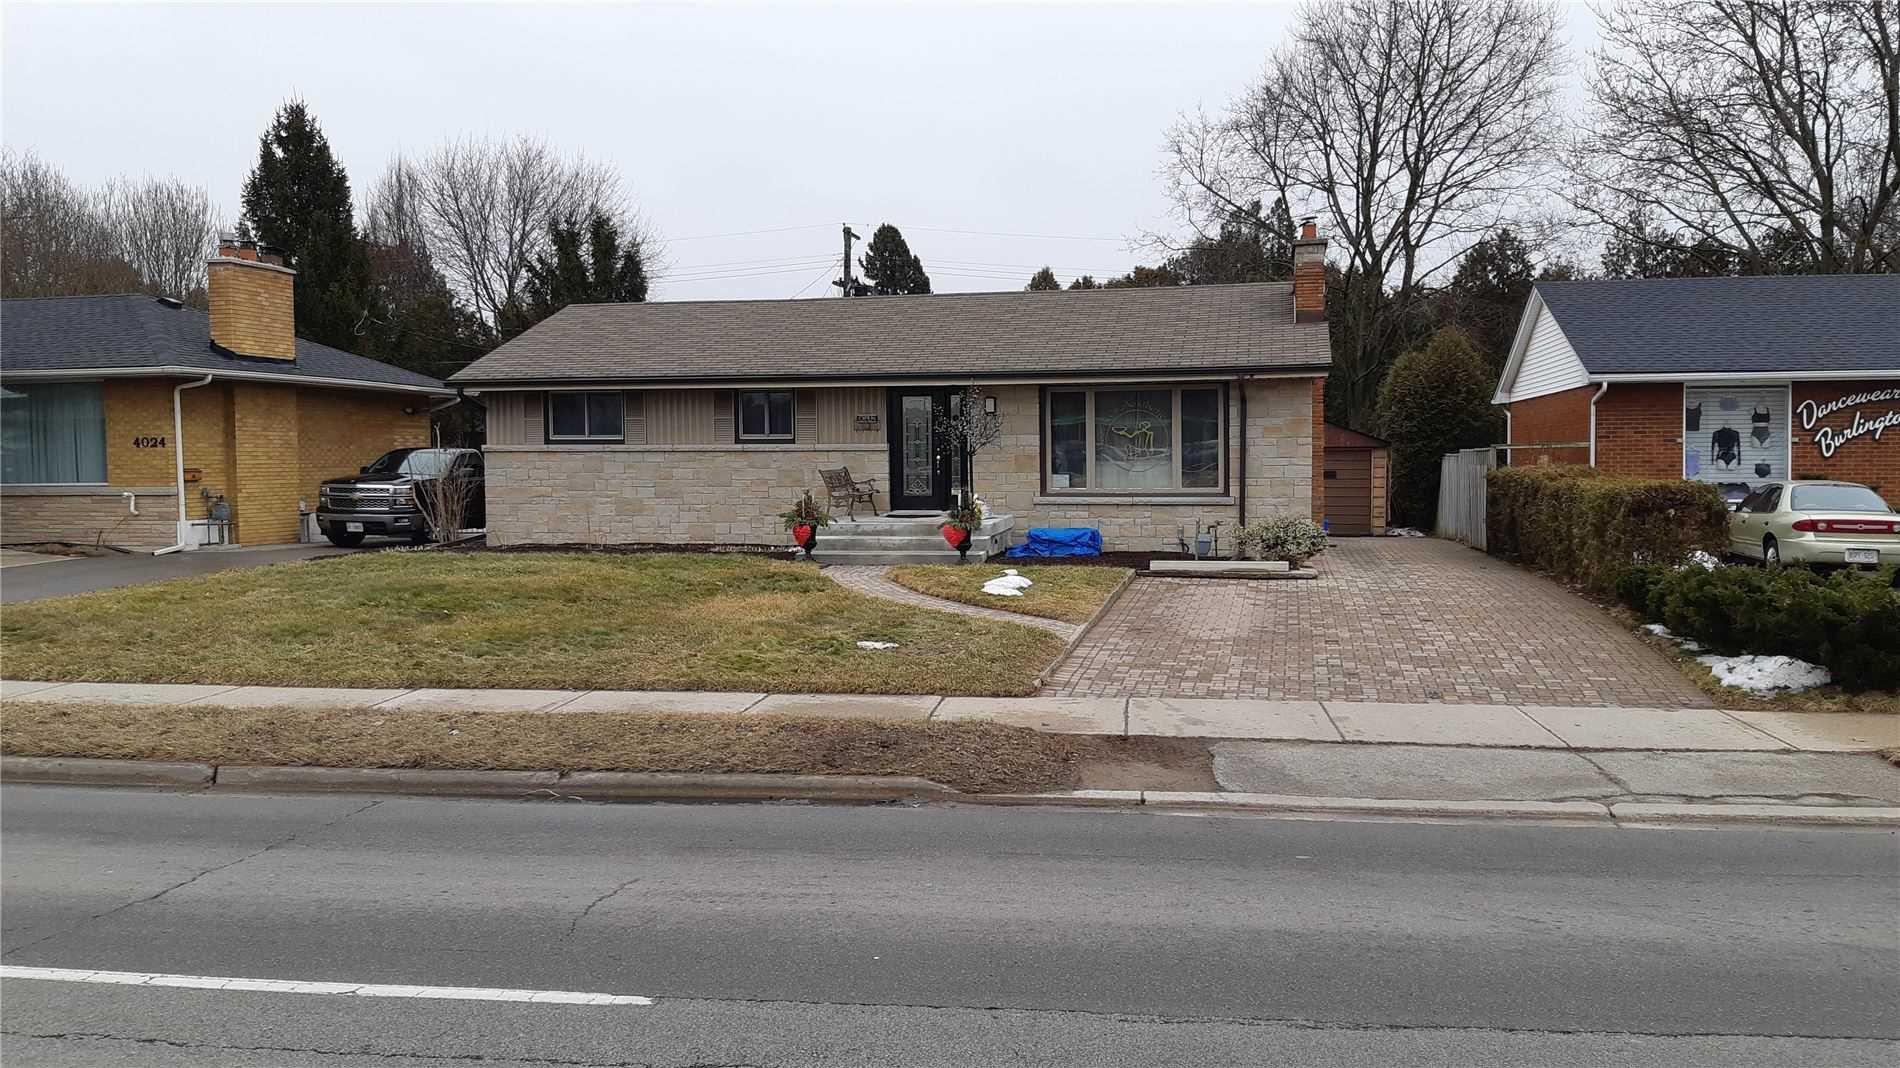 Main Photo: 4018 New St in Burlington: Shoreacres Commercial for sale : MLS®# W4701754